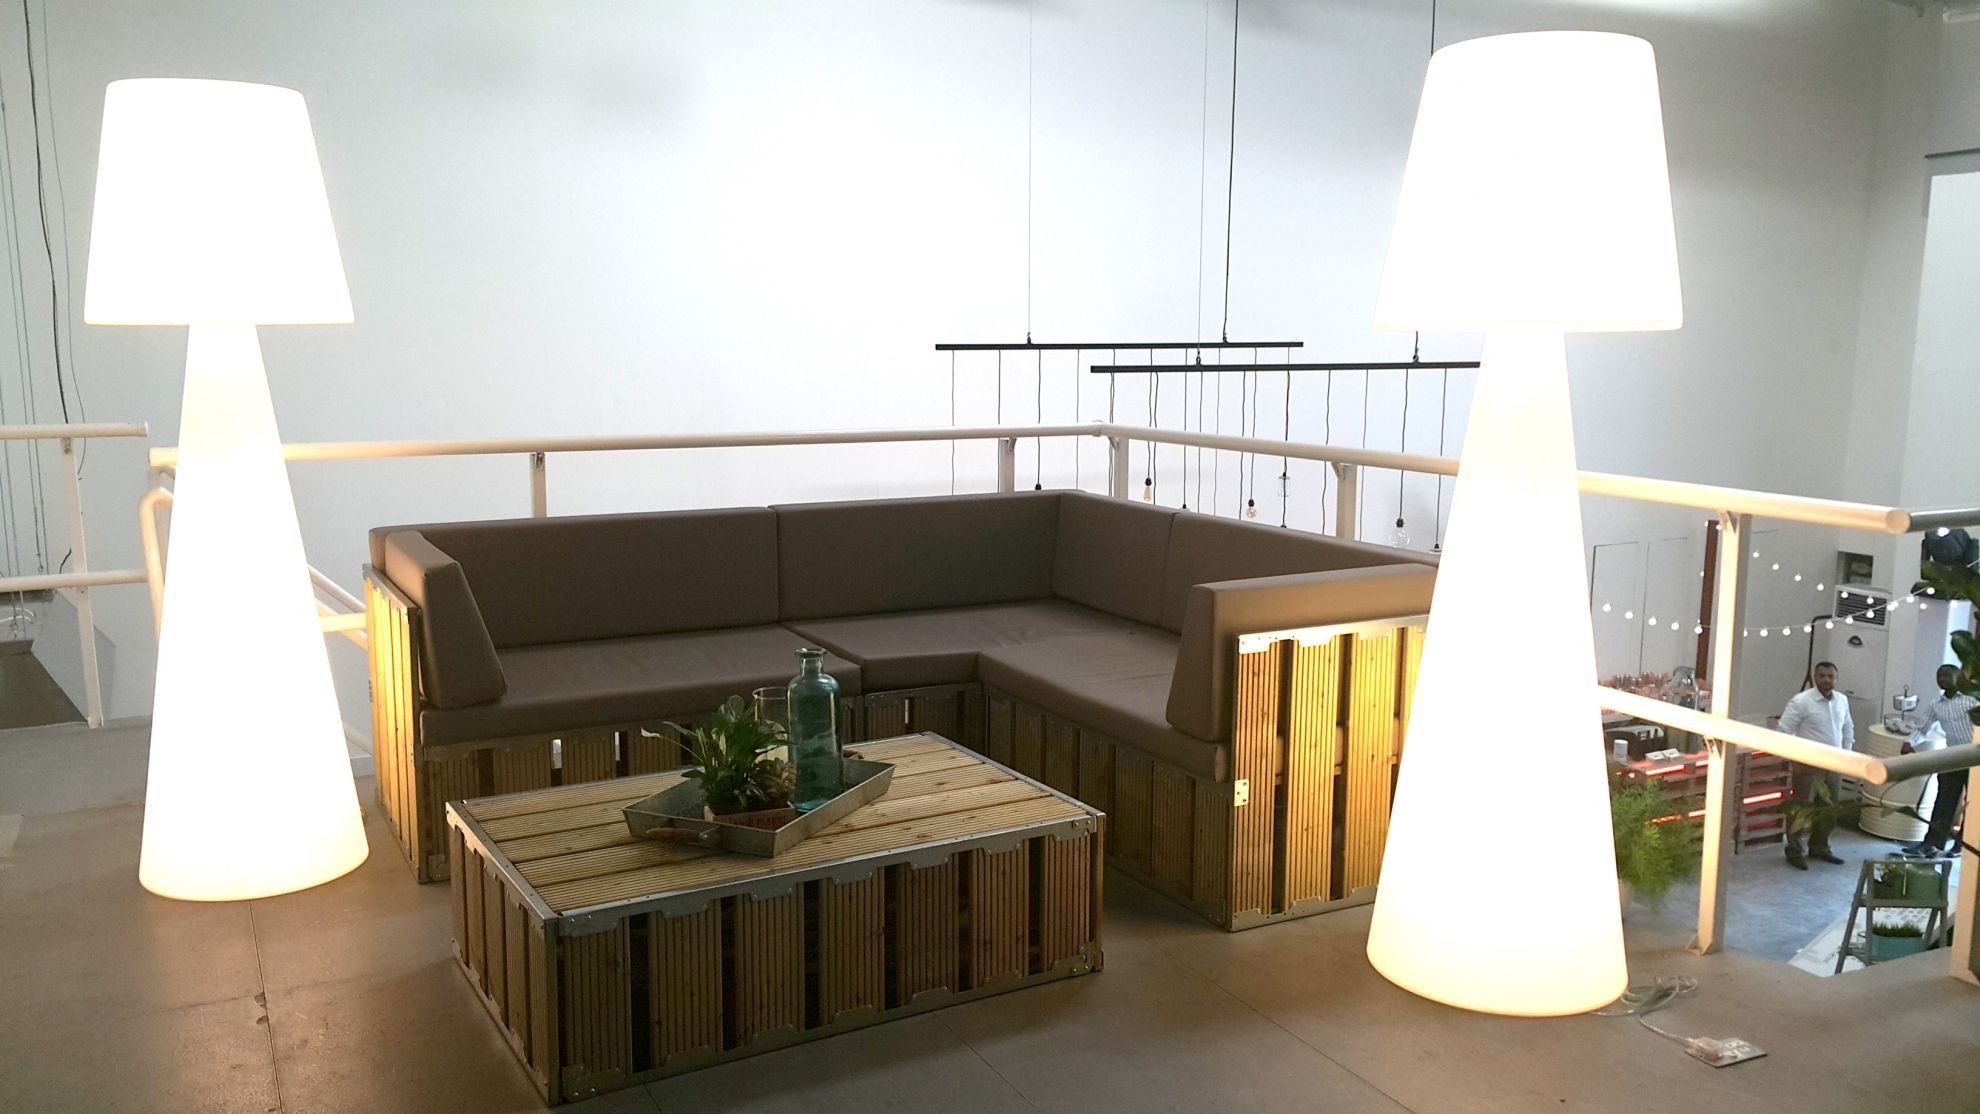 Muebles Modulares Disponibles En Www Yemso Es Yemso Pinterest # Muebles Positive